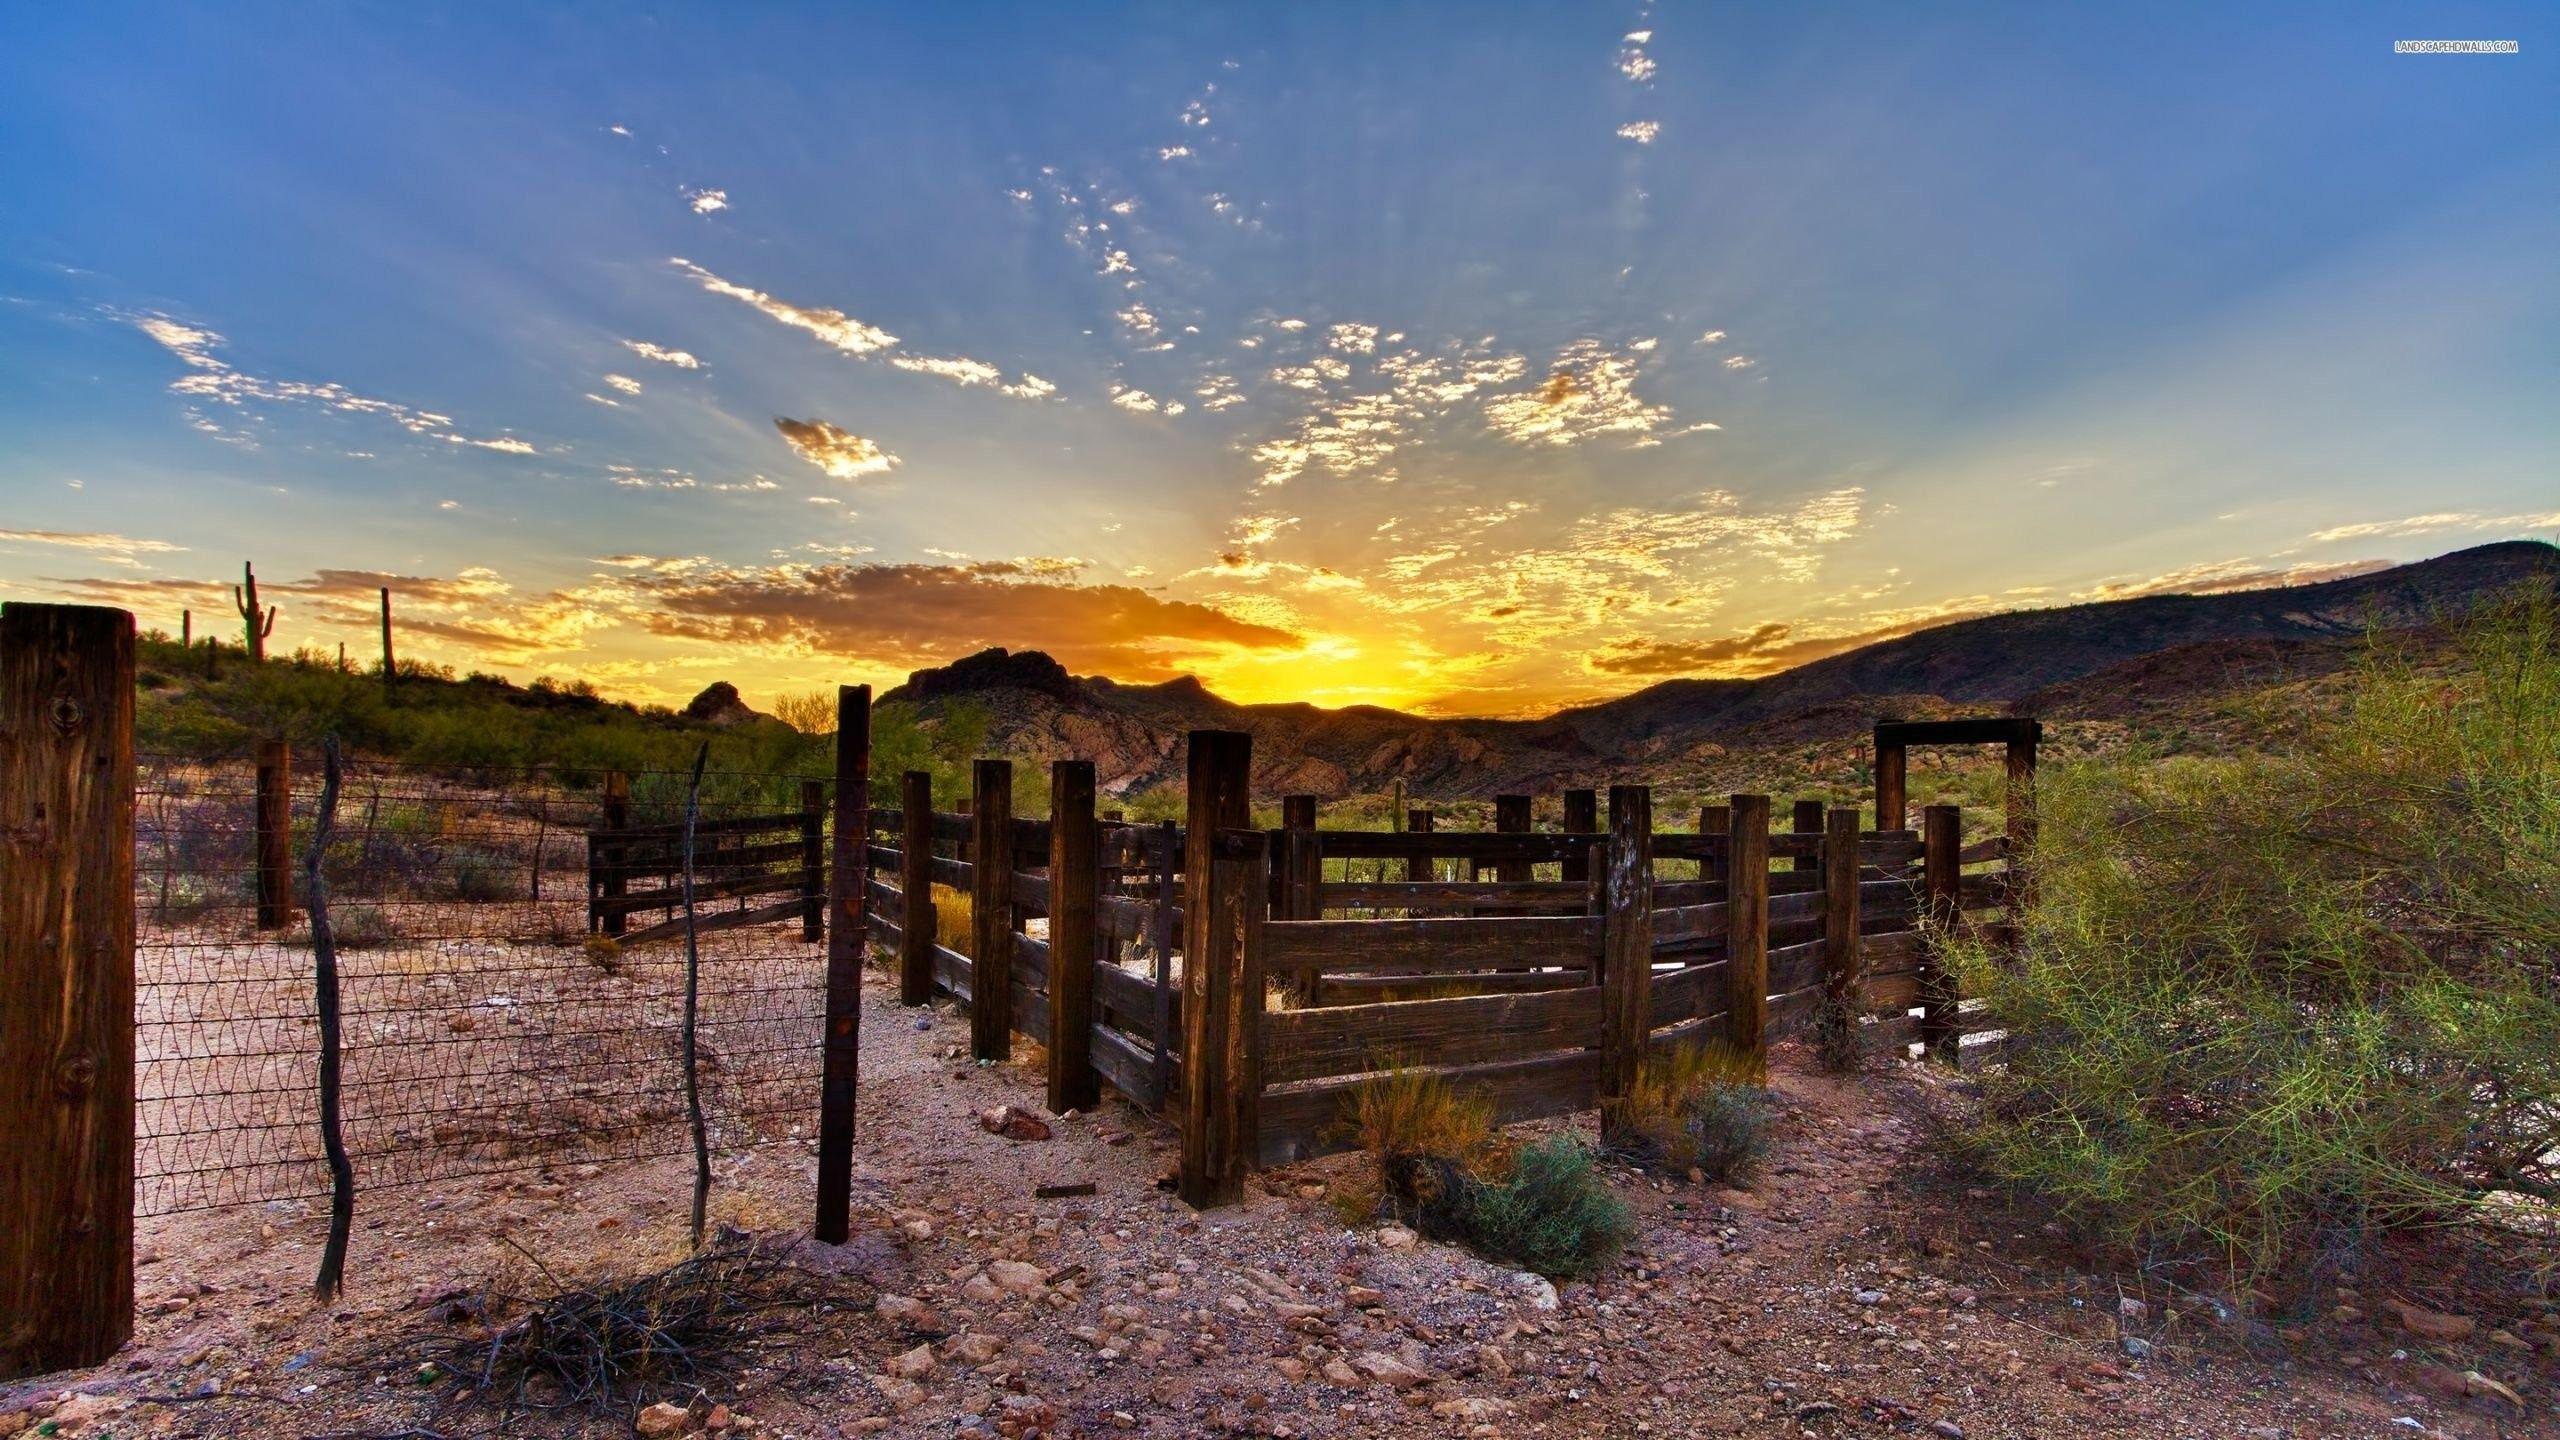 Texas Ranch Wallpaper (57+ images)